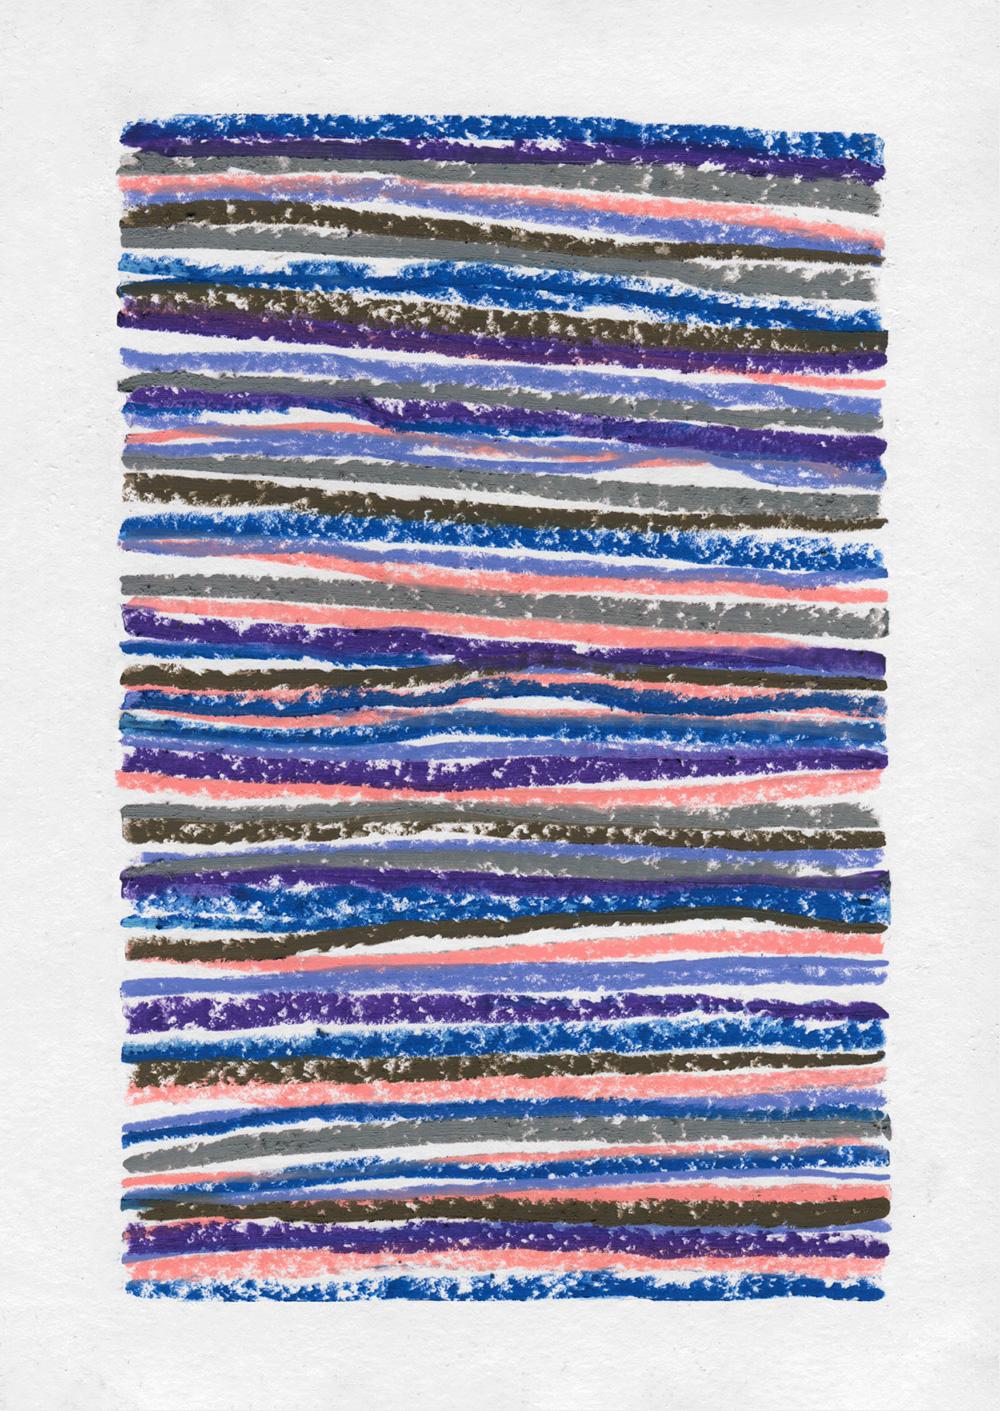 james-watkins-abstract-art-on-paper-london